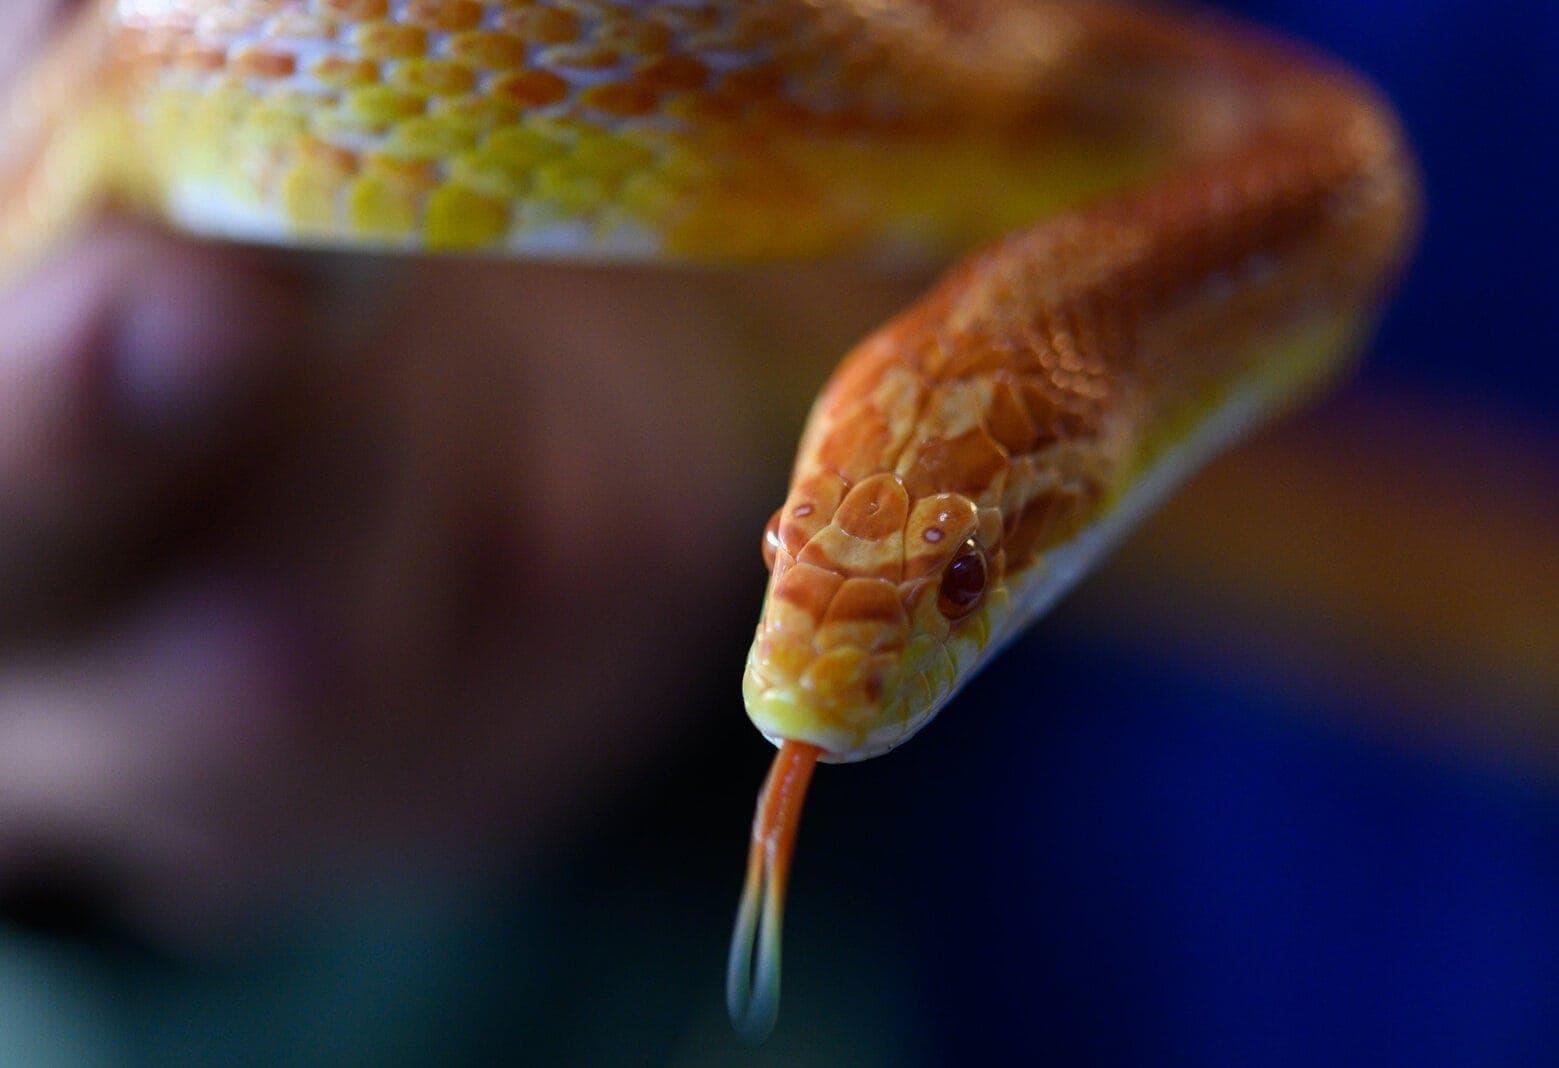 Kornnater Schlange